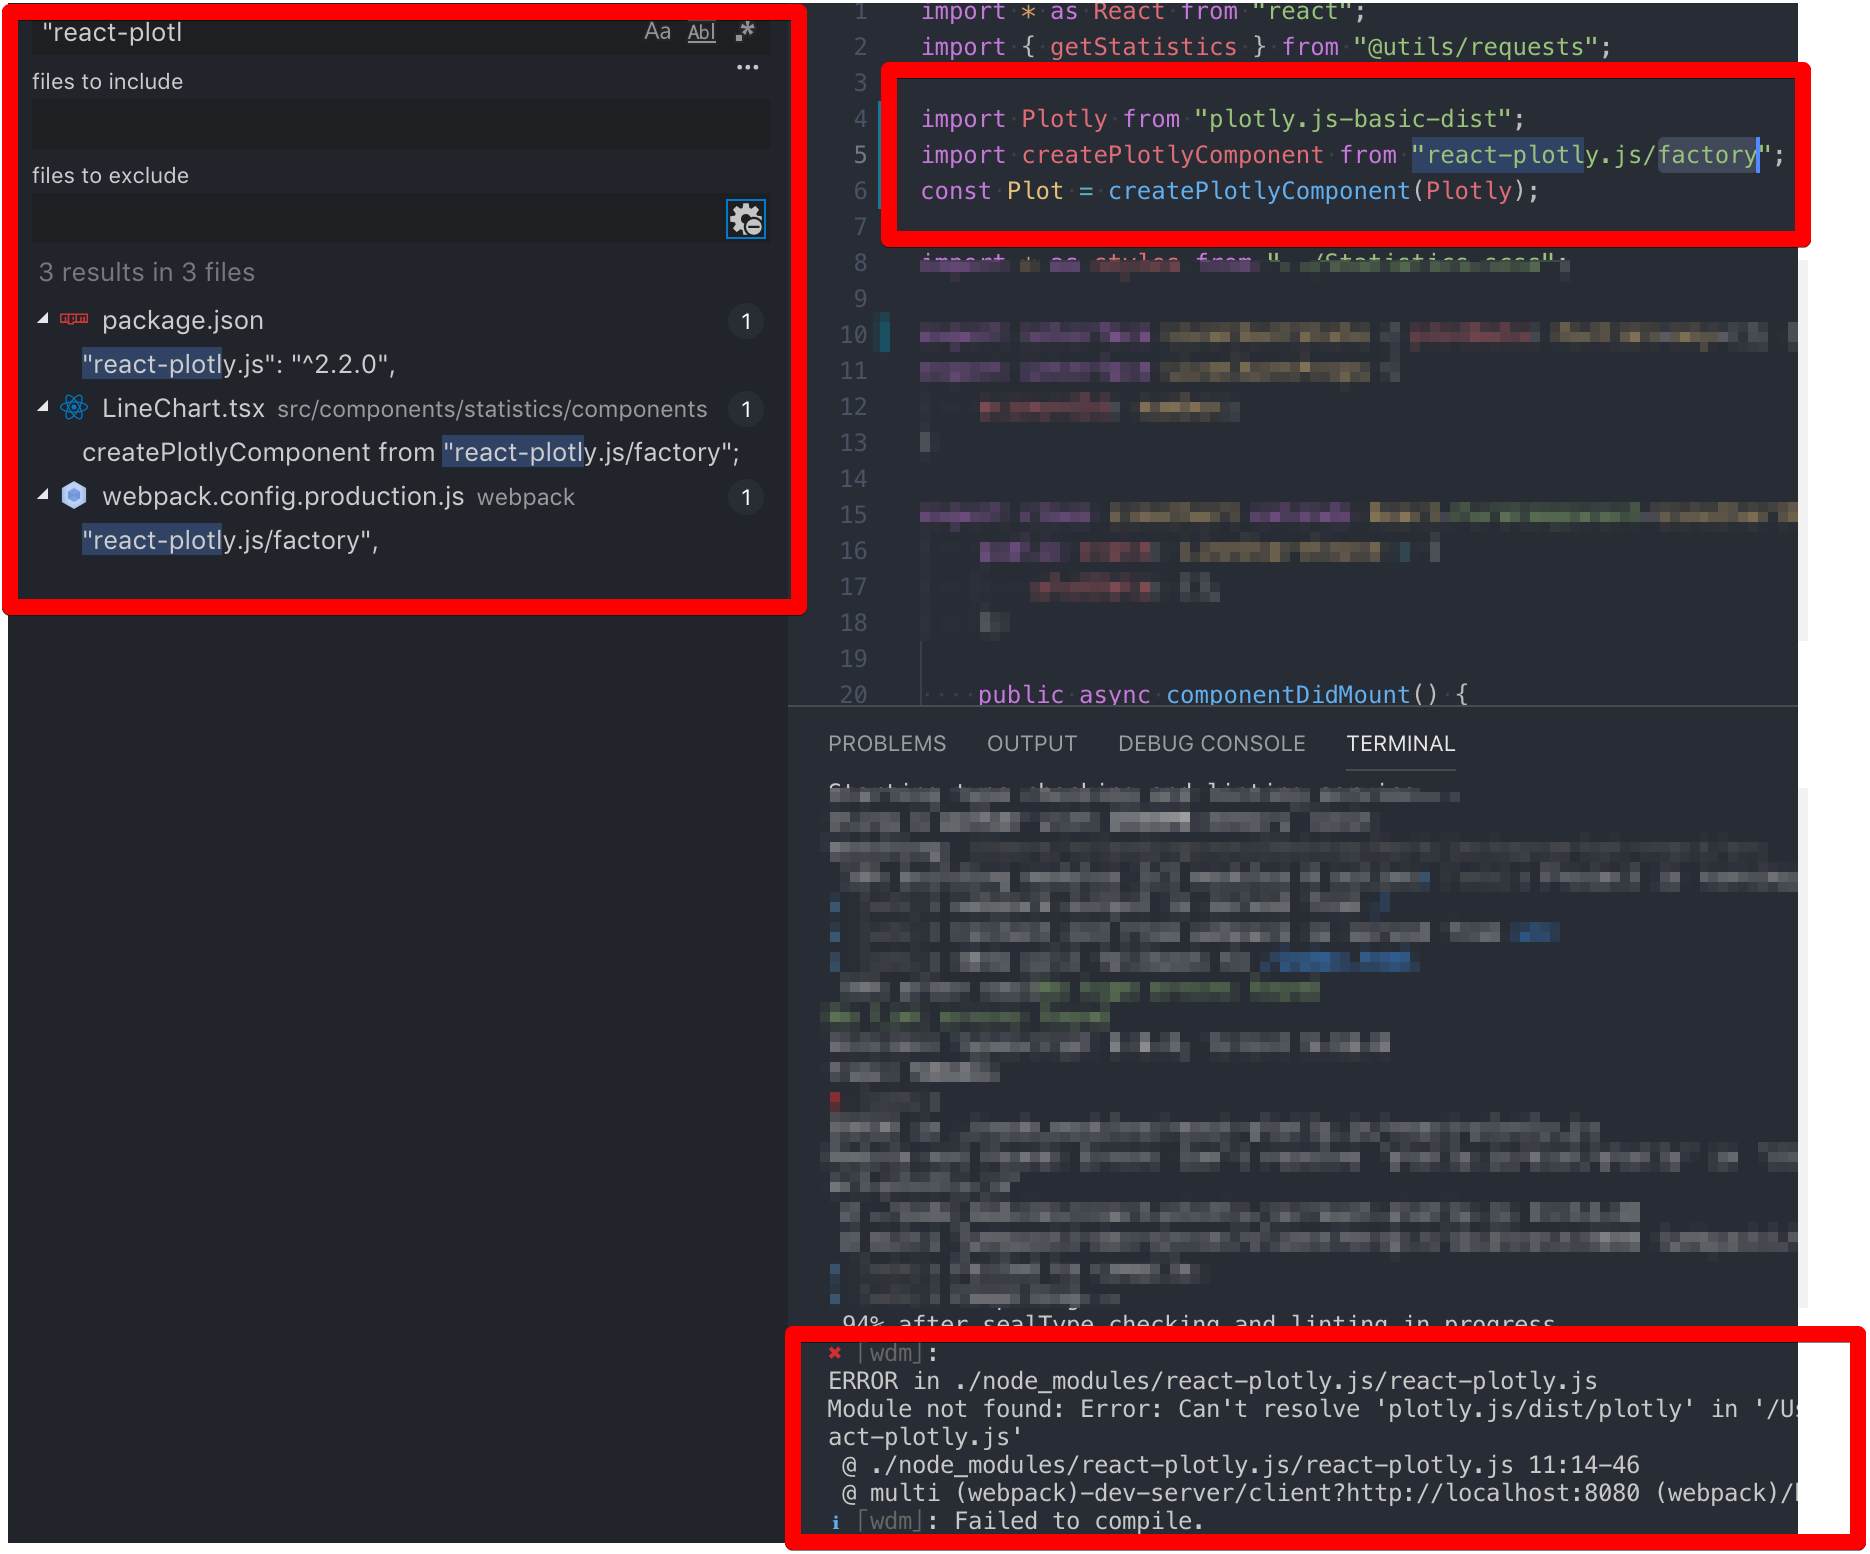 How to modularize react-plotly js? · Issue #98 · plotly/react-plotly